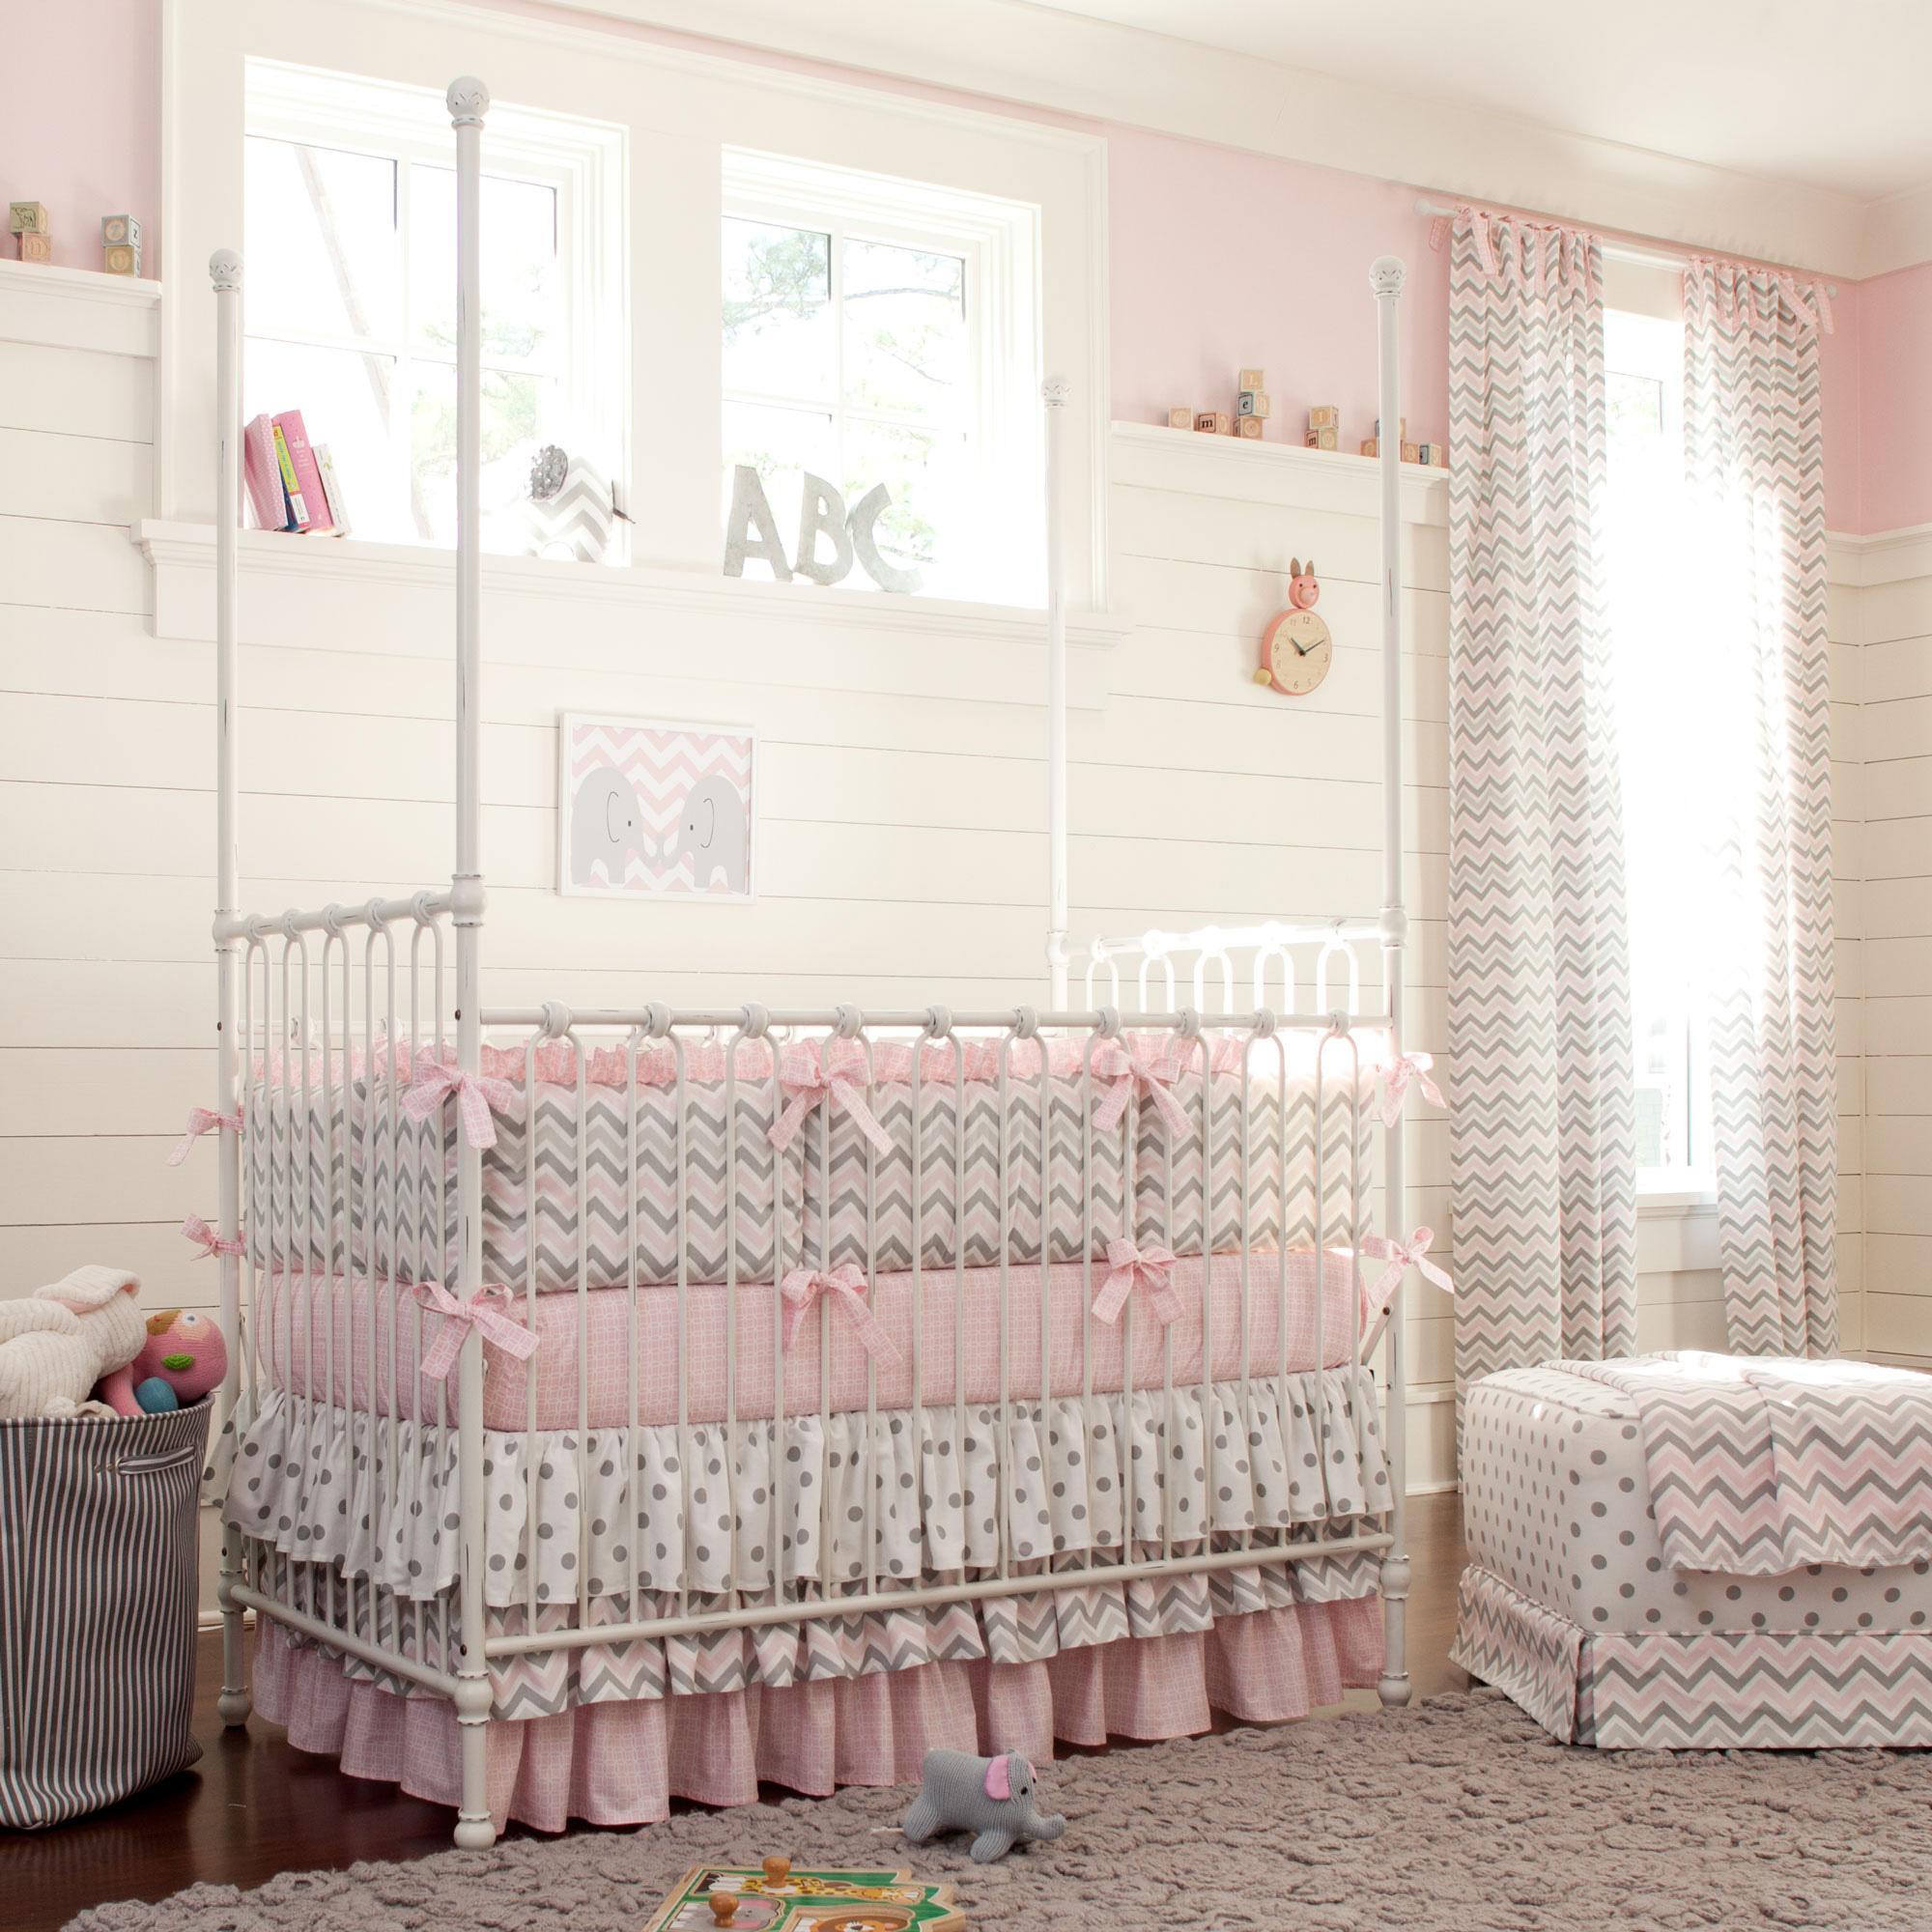 girl crib bedding pink and gray chevron baby crib bedding XJQDZRE